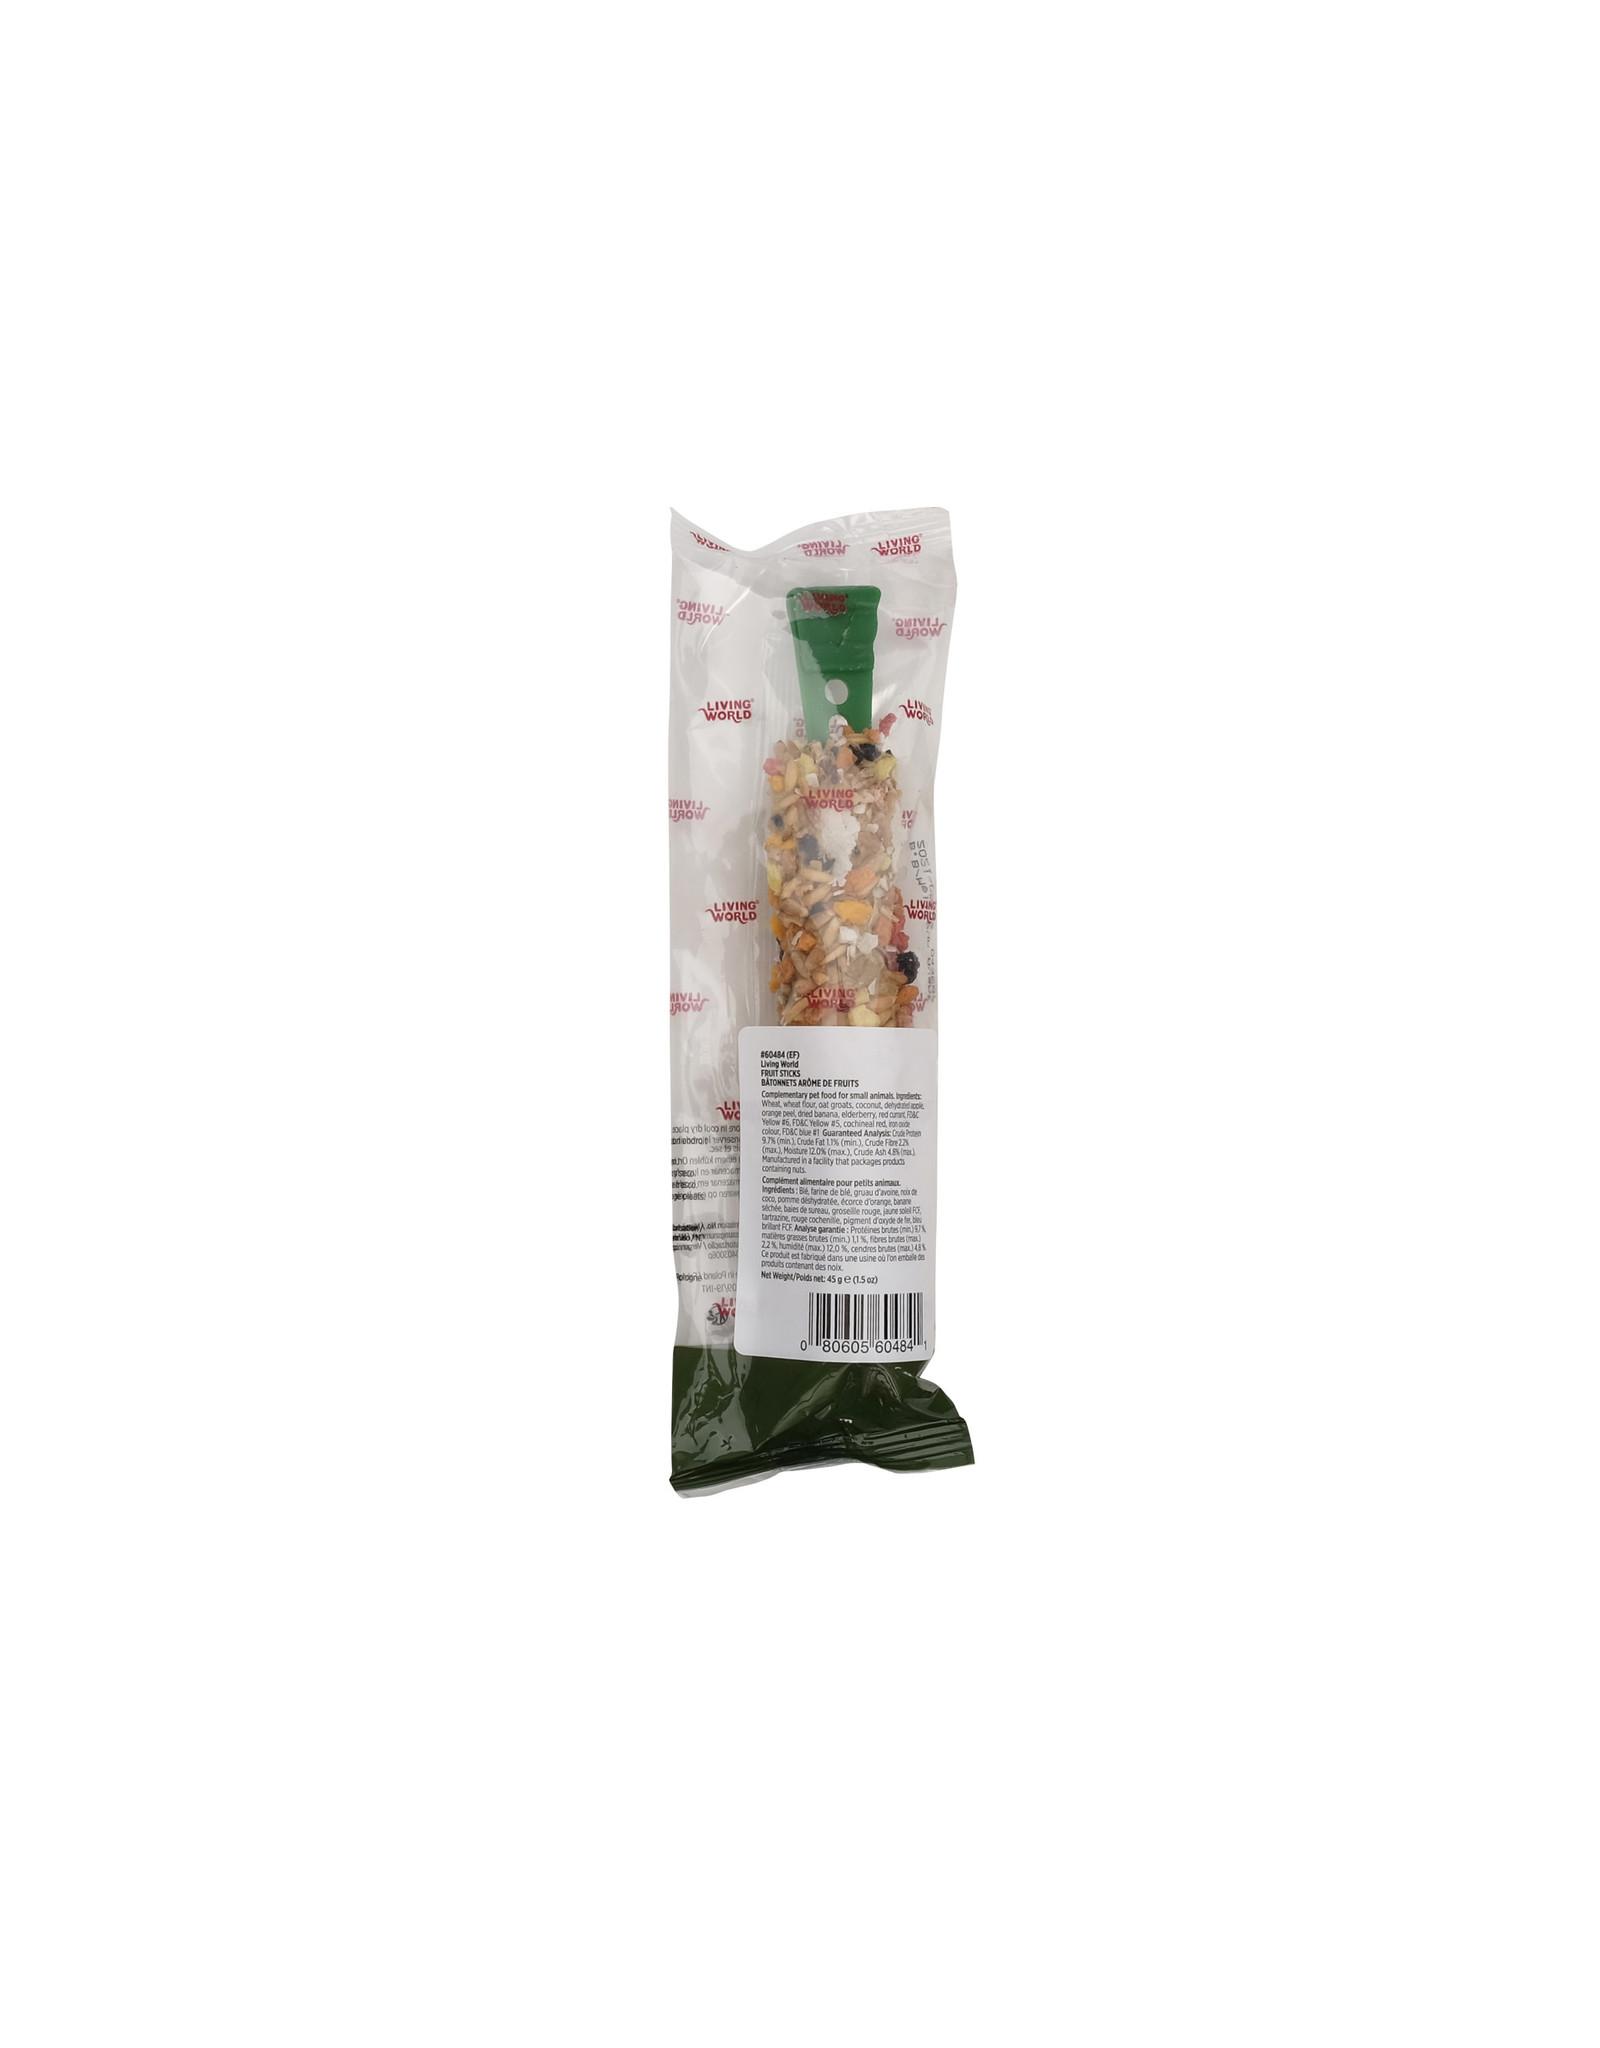 Living World Living World Small Animal Sticks, Fruit Flavour, 45 g (1.5 oz)